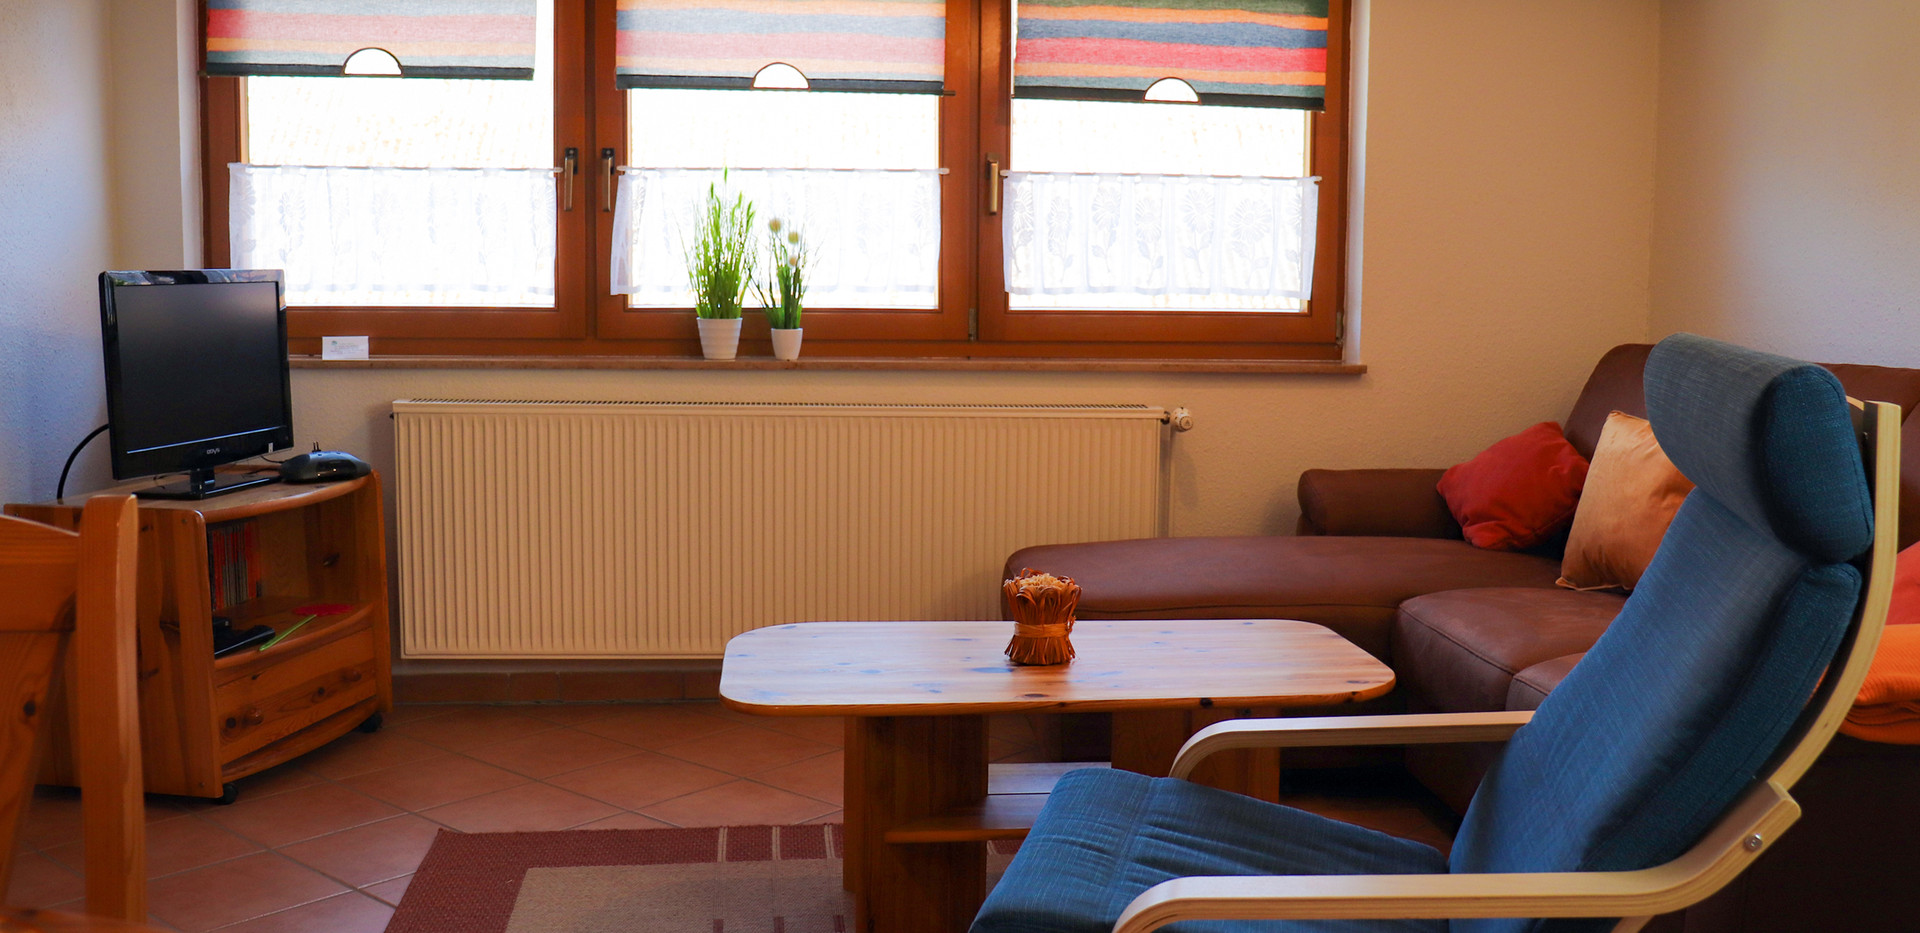 Dennhornshof Wohnung 3